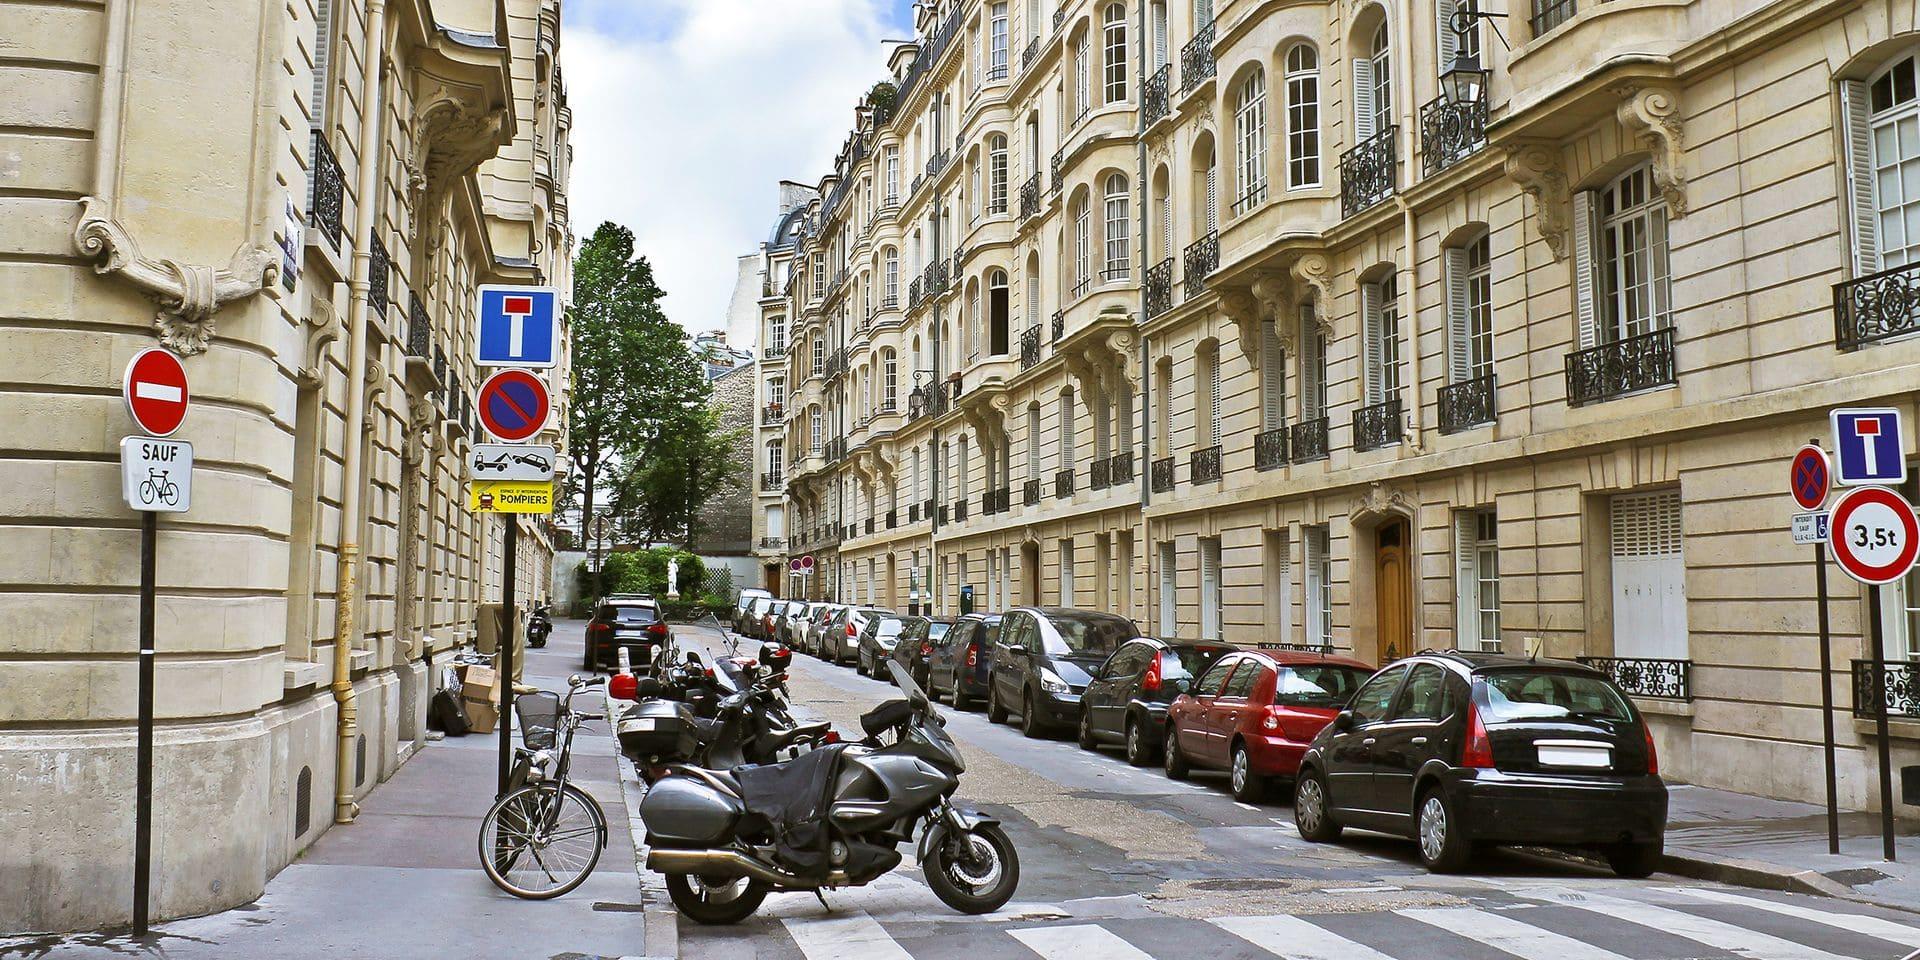 À Paris aussi, la circulation sera limitée à 30 km/h